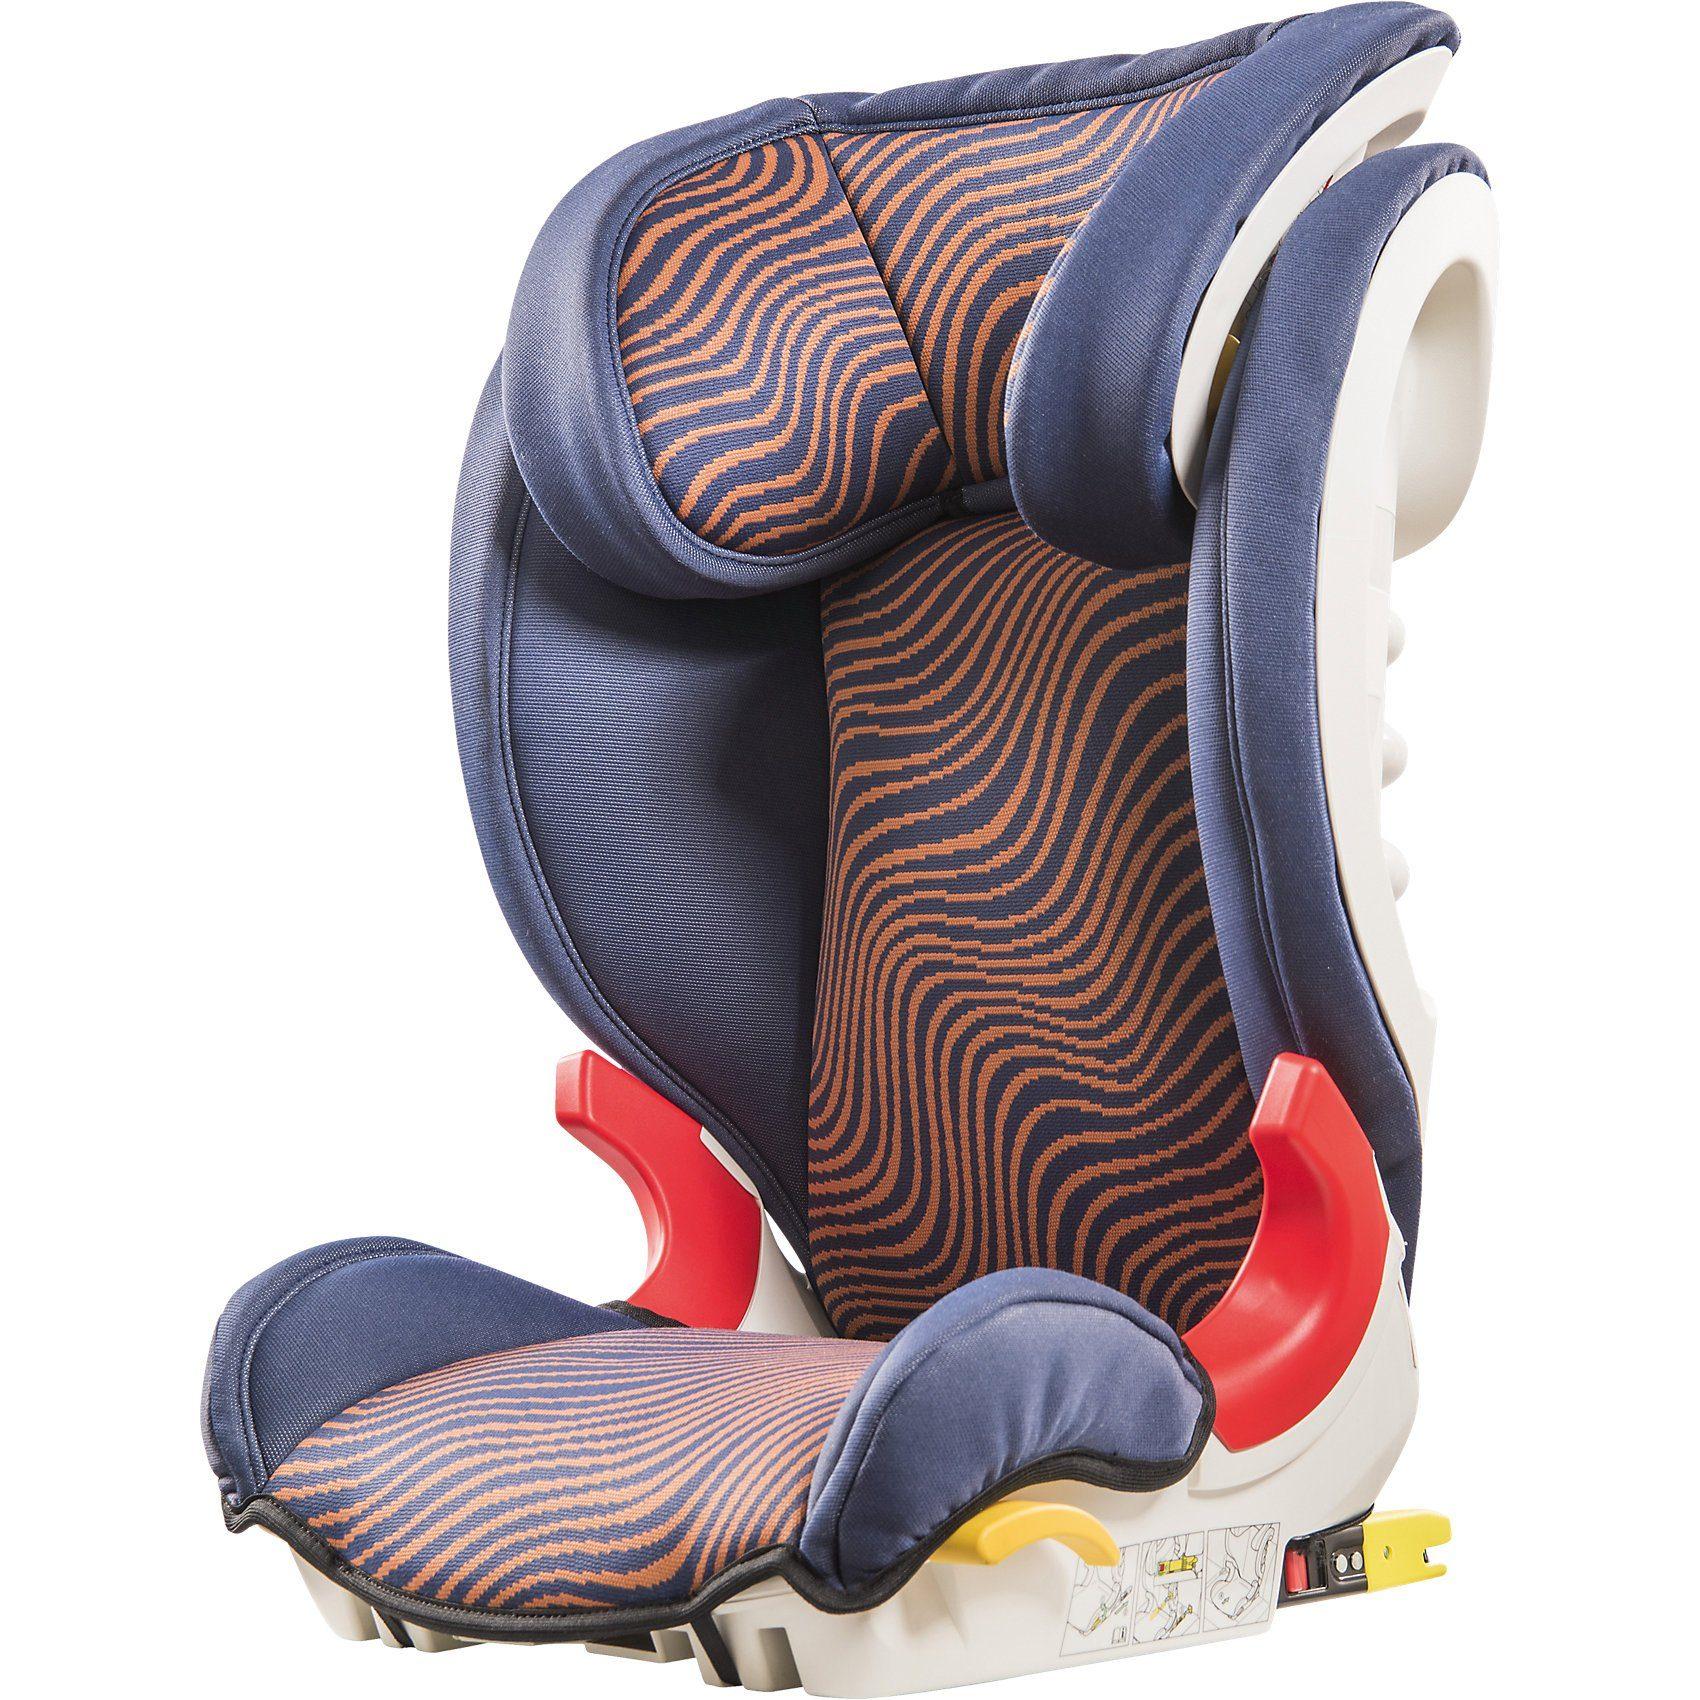 Baier Kindersitz Auto-Kindersitz Adefix, Safari